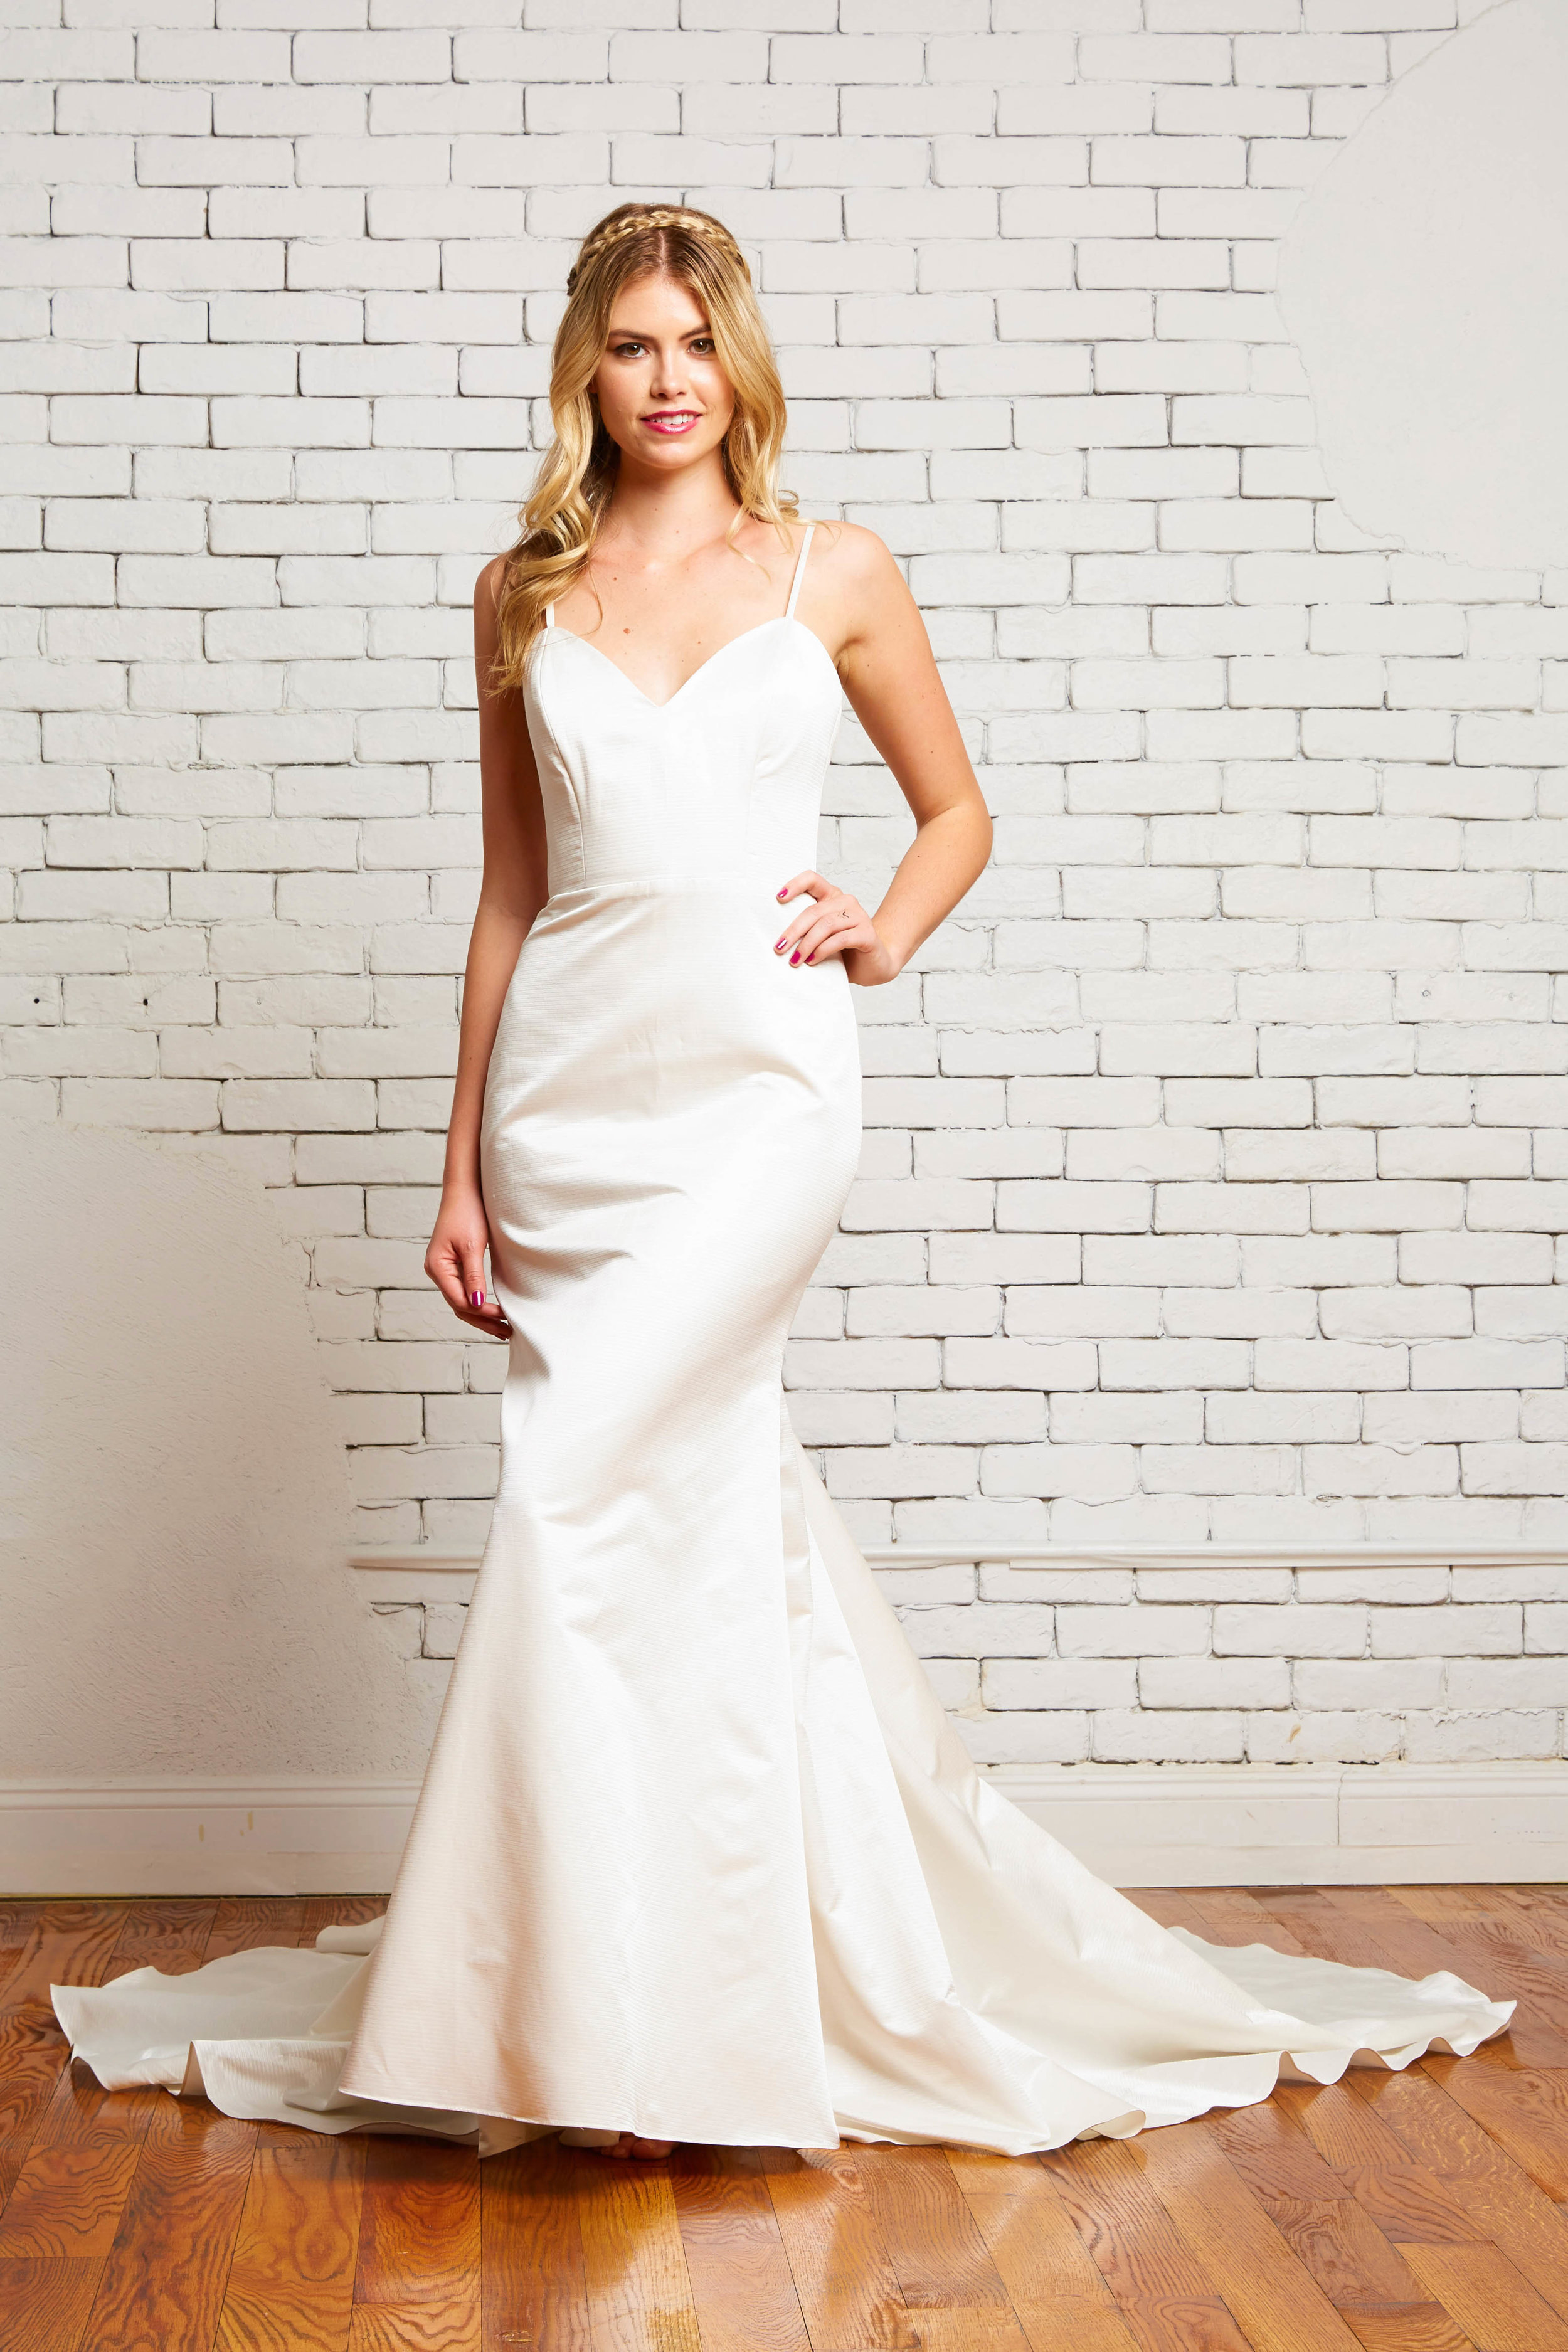 23A. Yvette Front-Rebecca Schoneveld-2-142_striped_satin_sweetheart_neckline_pleated_train_modern_gown.jpg